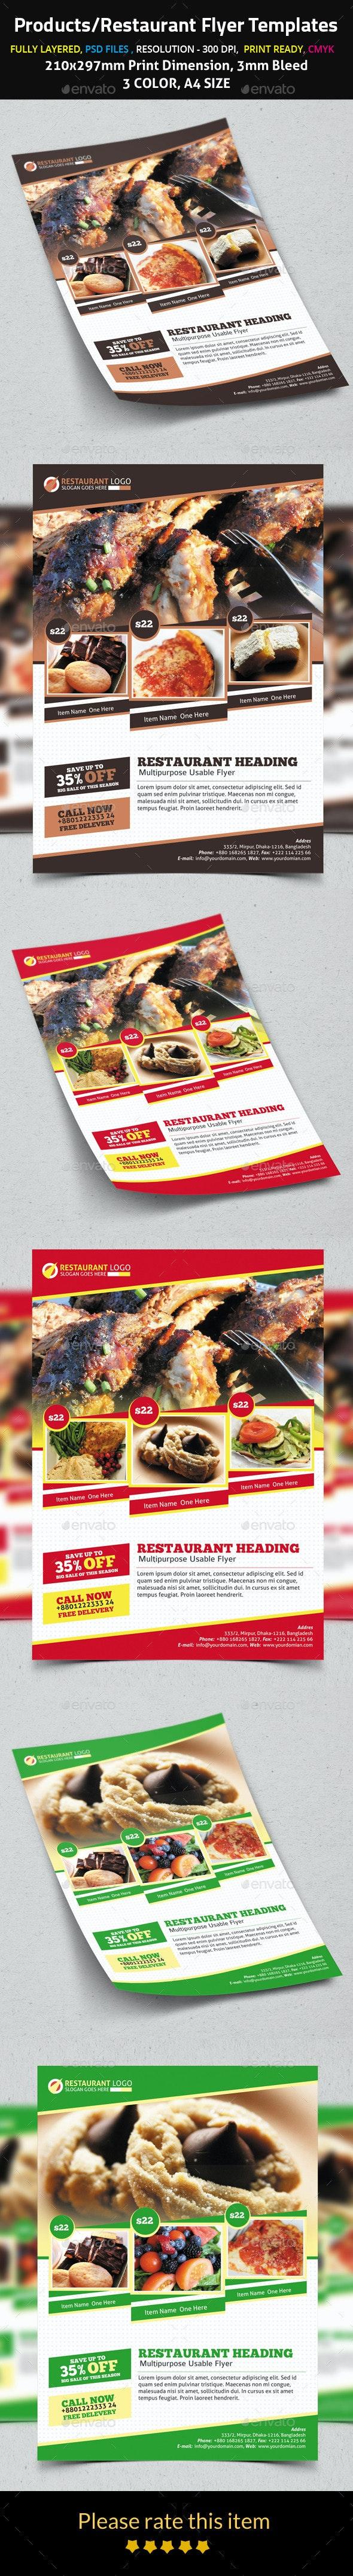 Products/Restaurant Flyer Templates - Flyers Print Templates